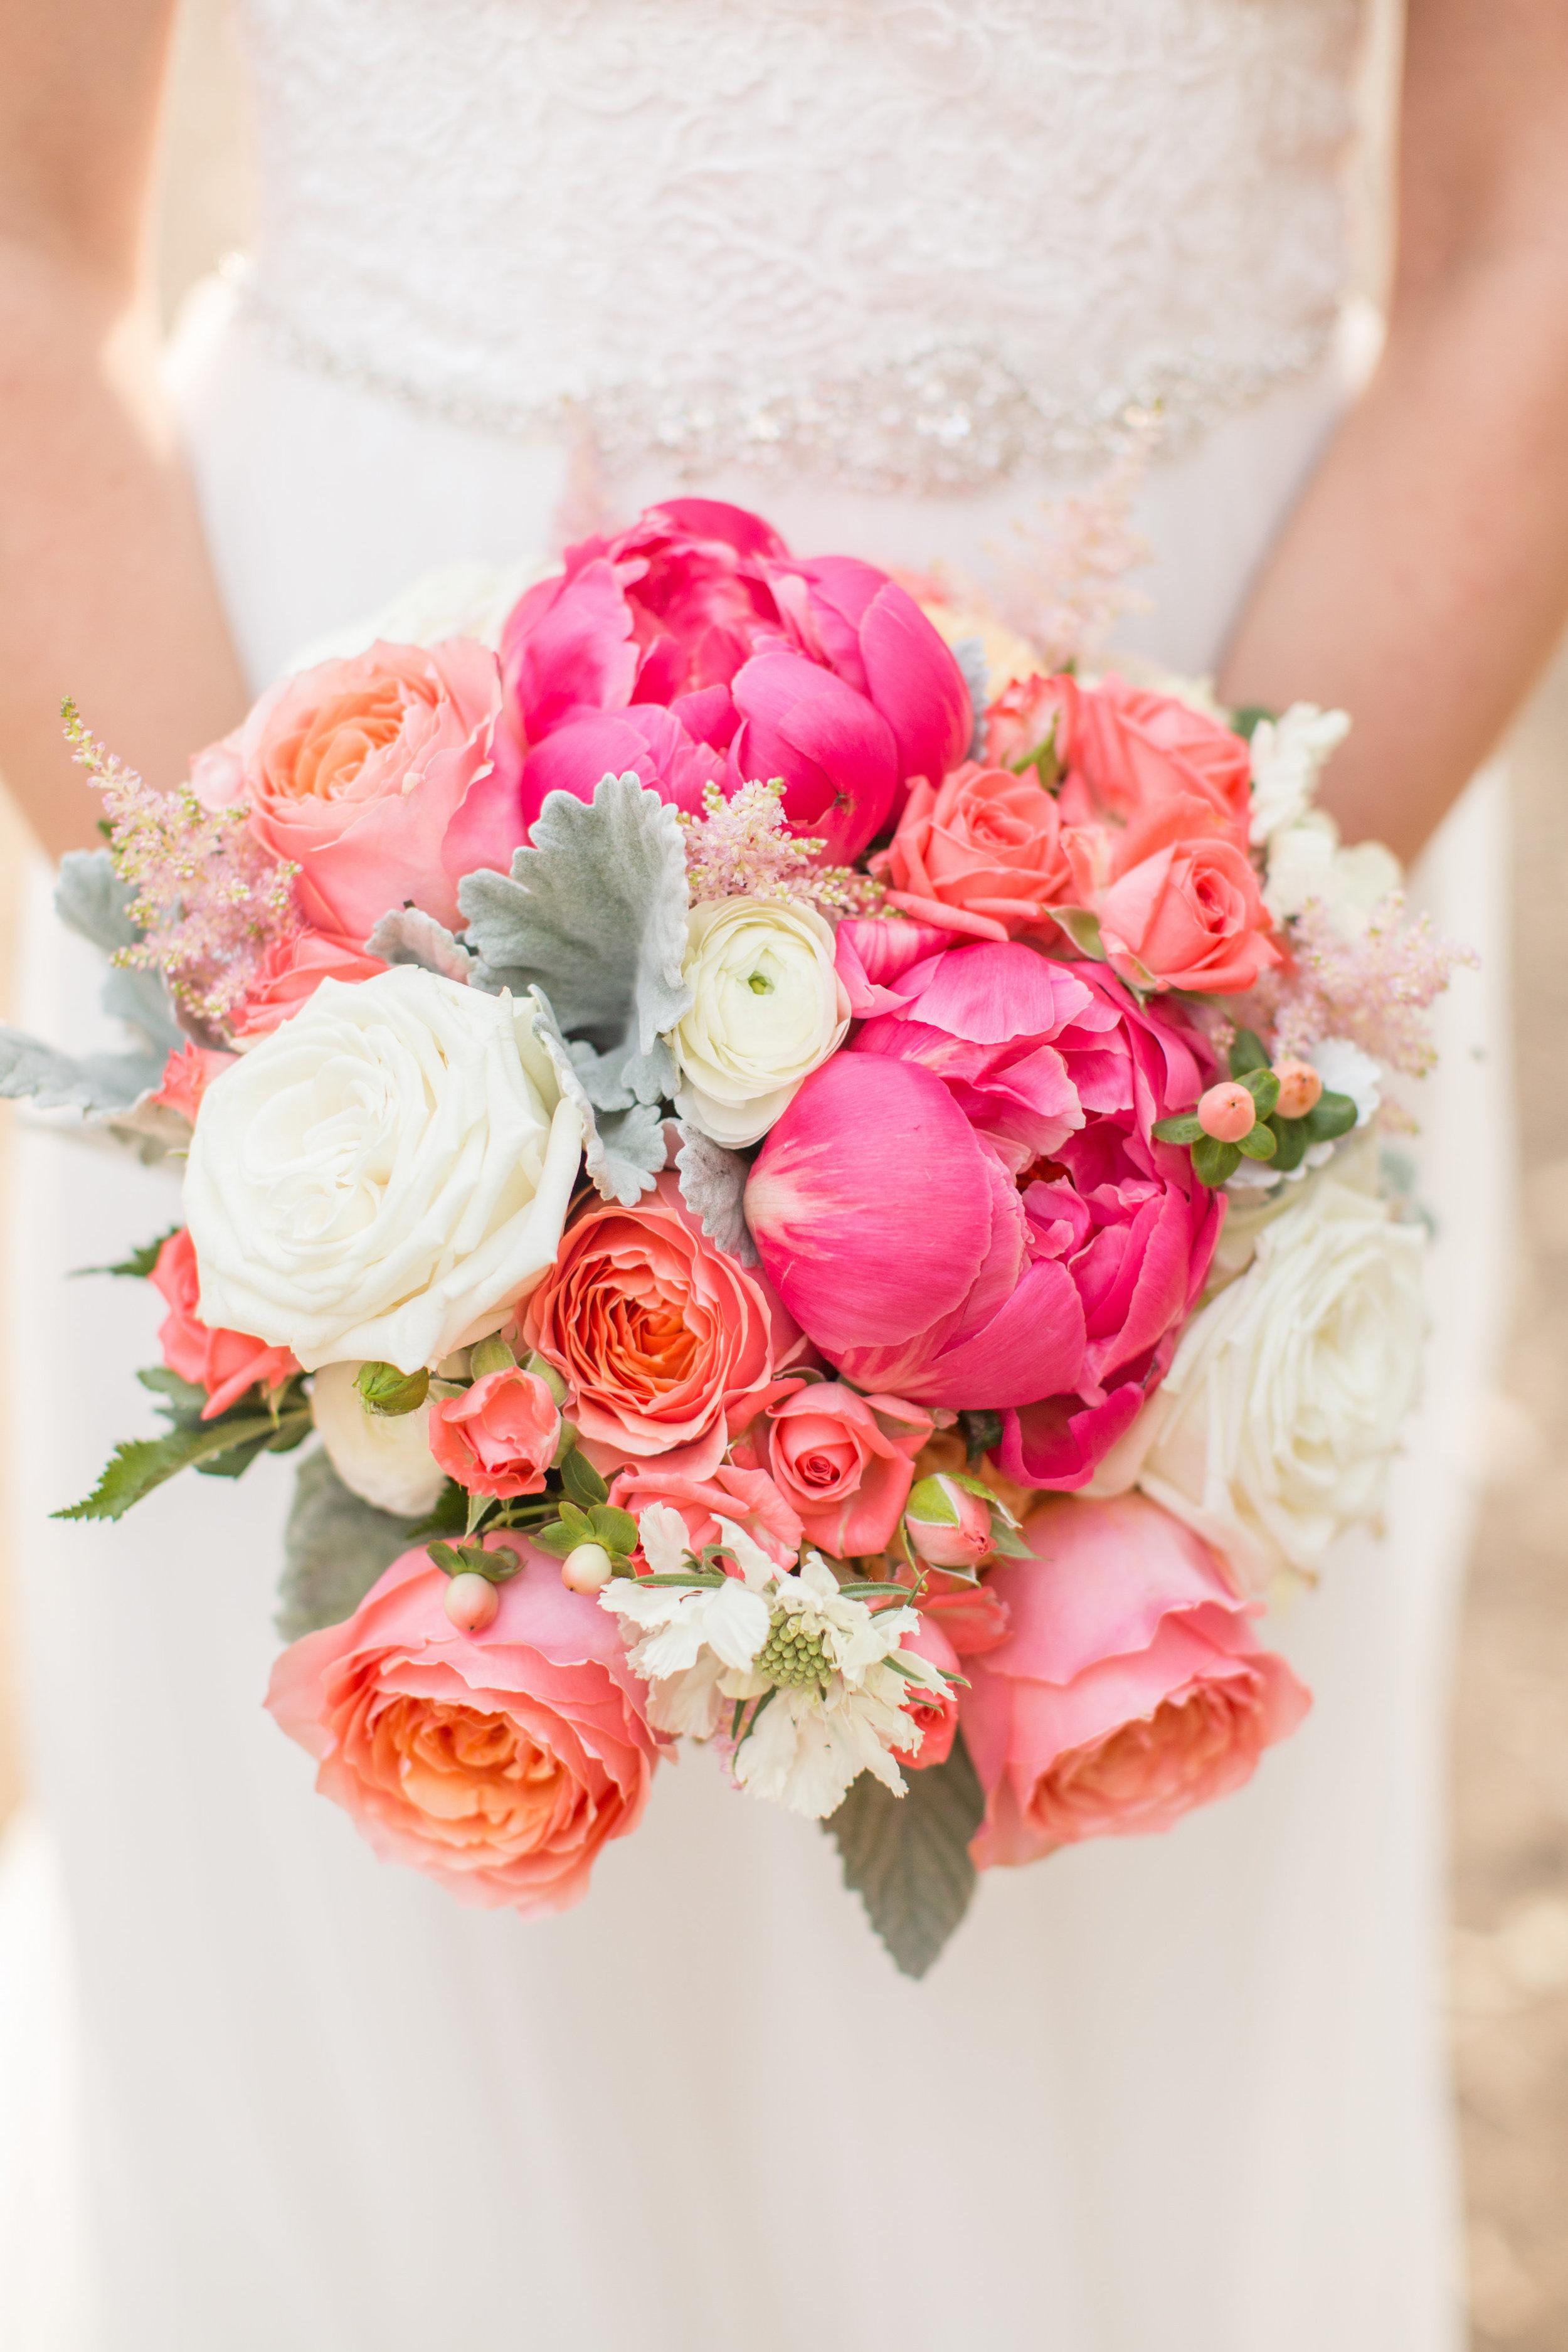 santa-barbara-elopement-elope-wedding-planning-planner-coordinator-day-of-rustic-ellwood-bluffs-beach-front-ocean-view (3).jpg